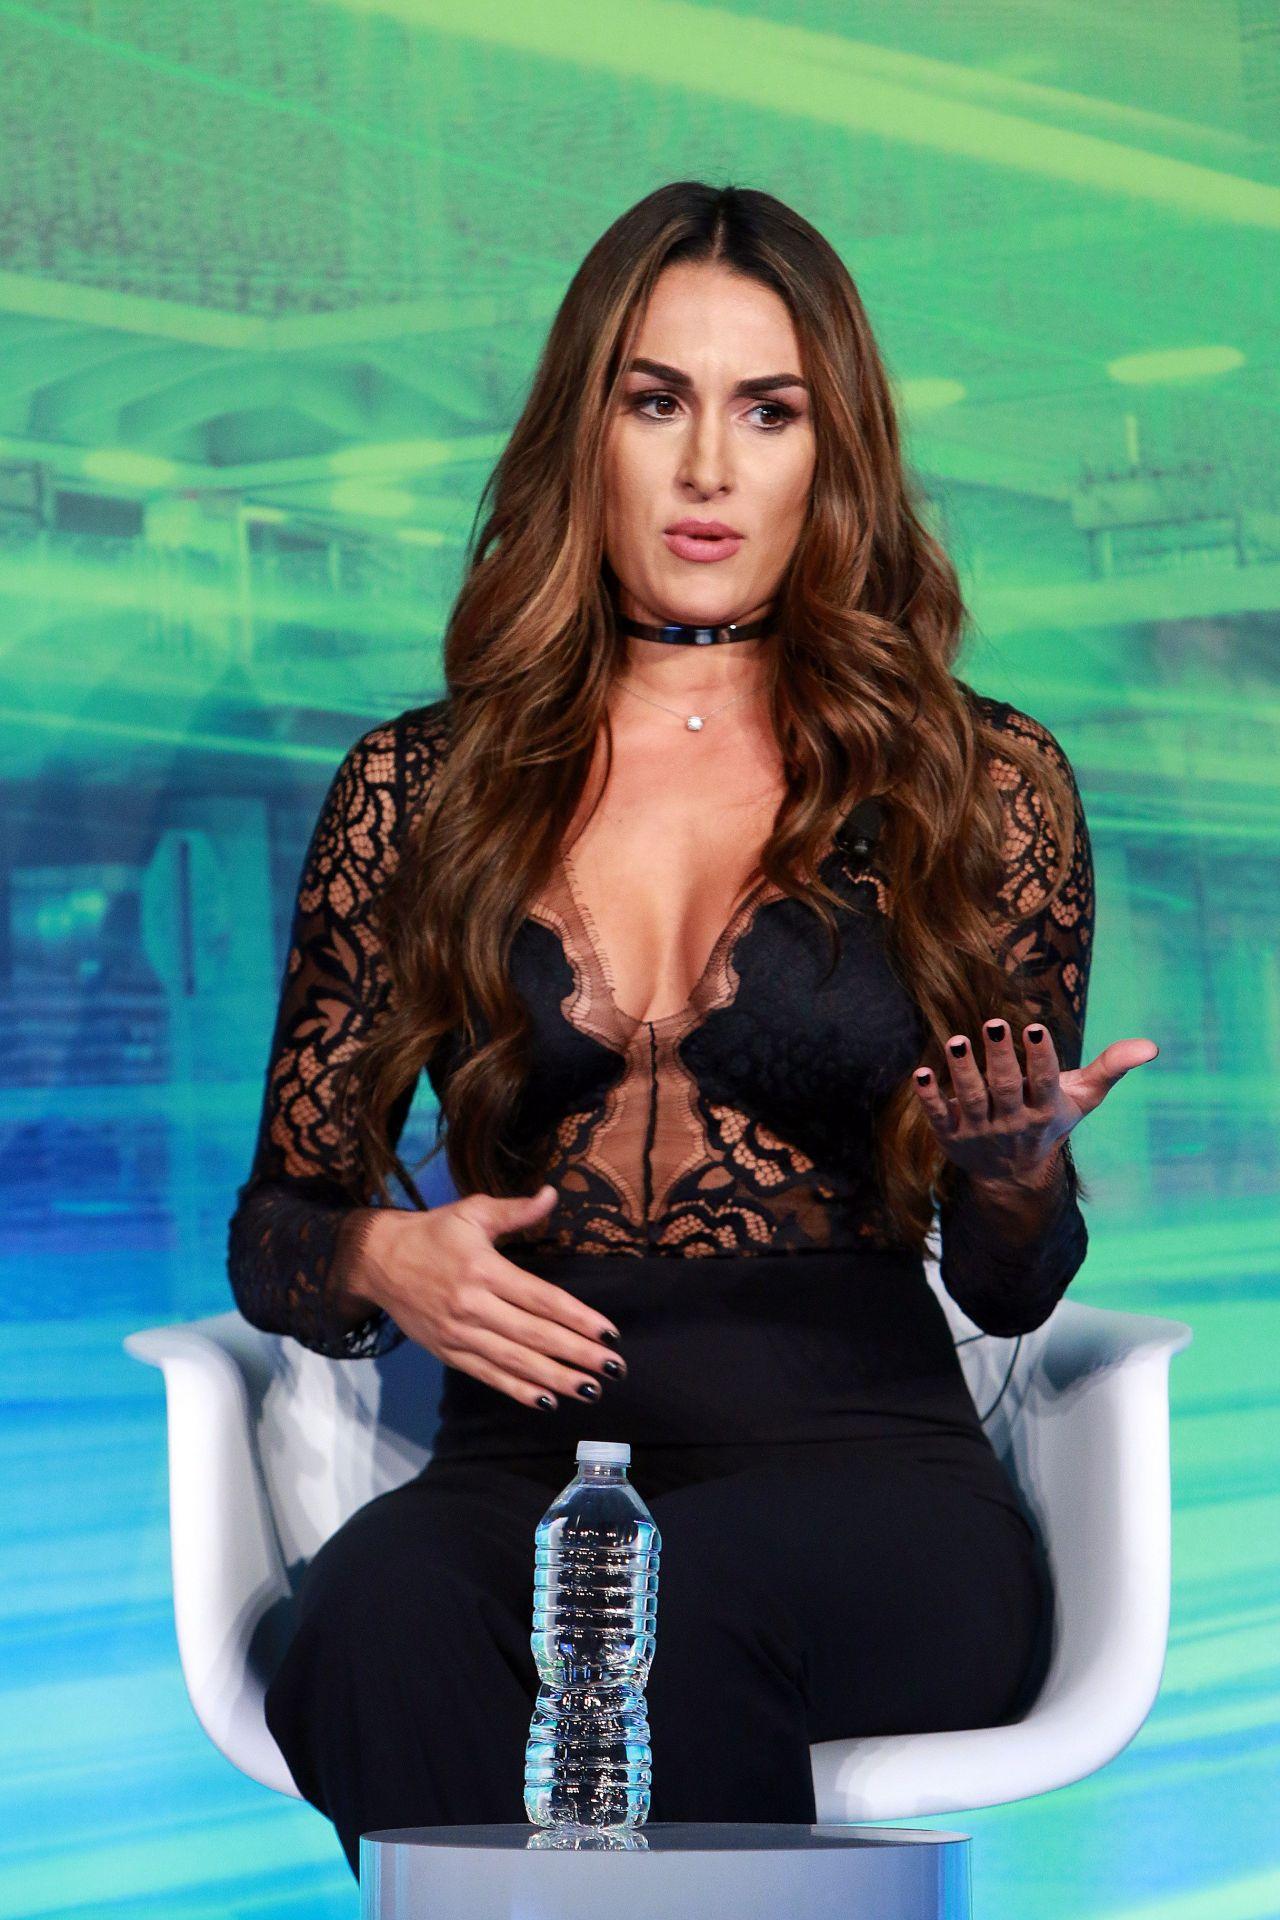 B list hbo celebrity milf does porn 10